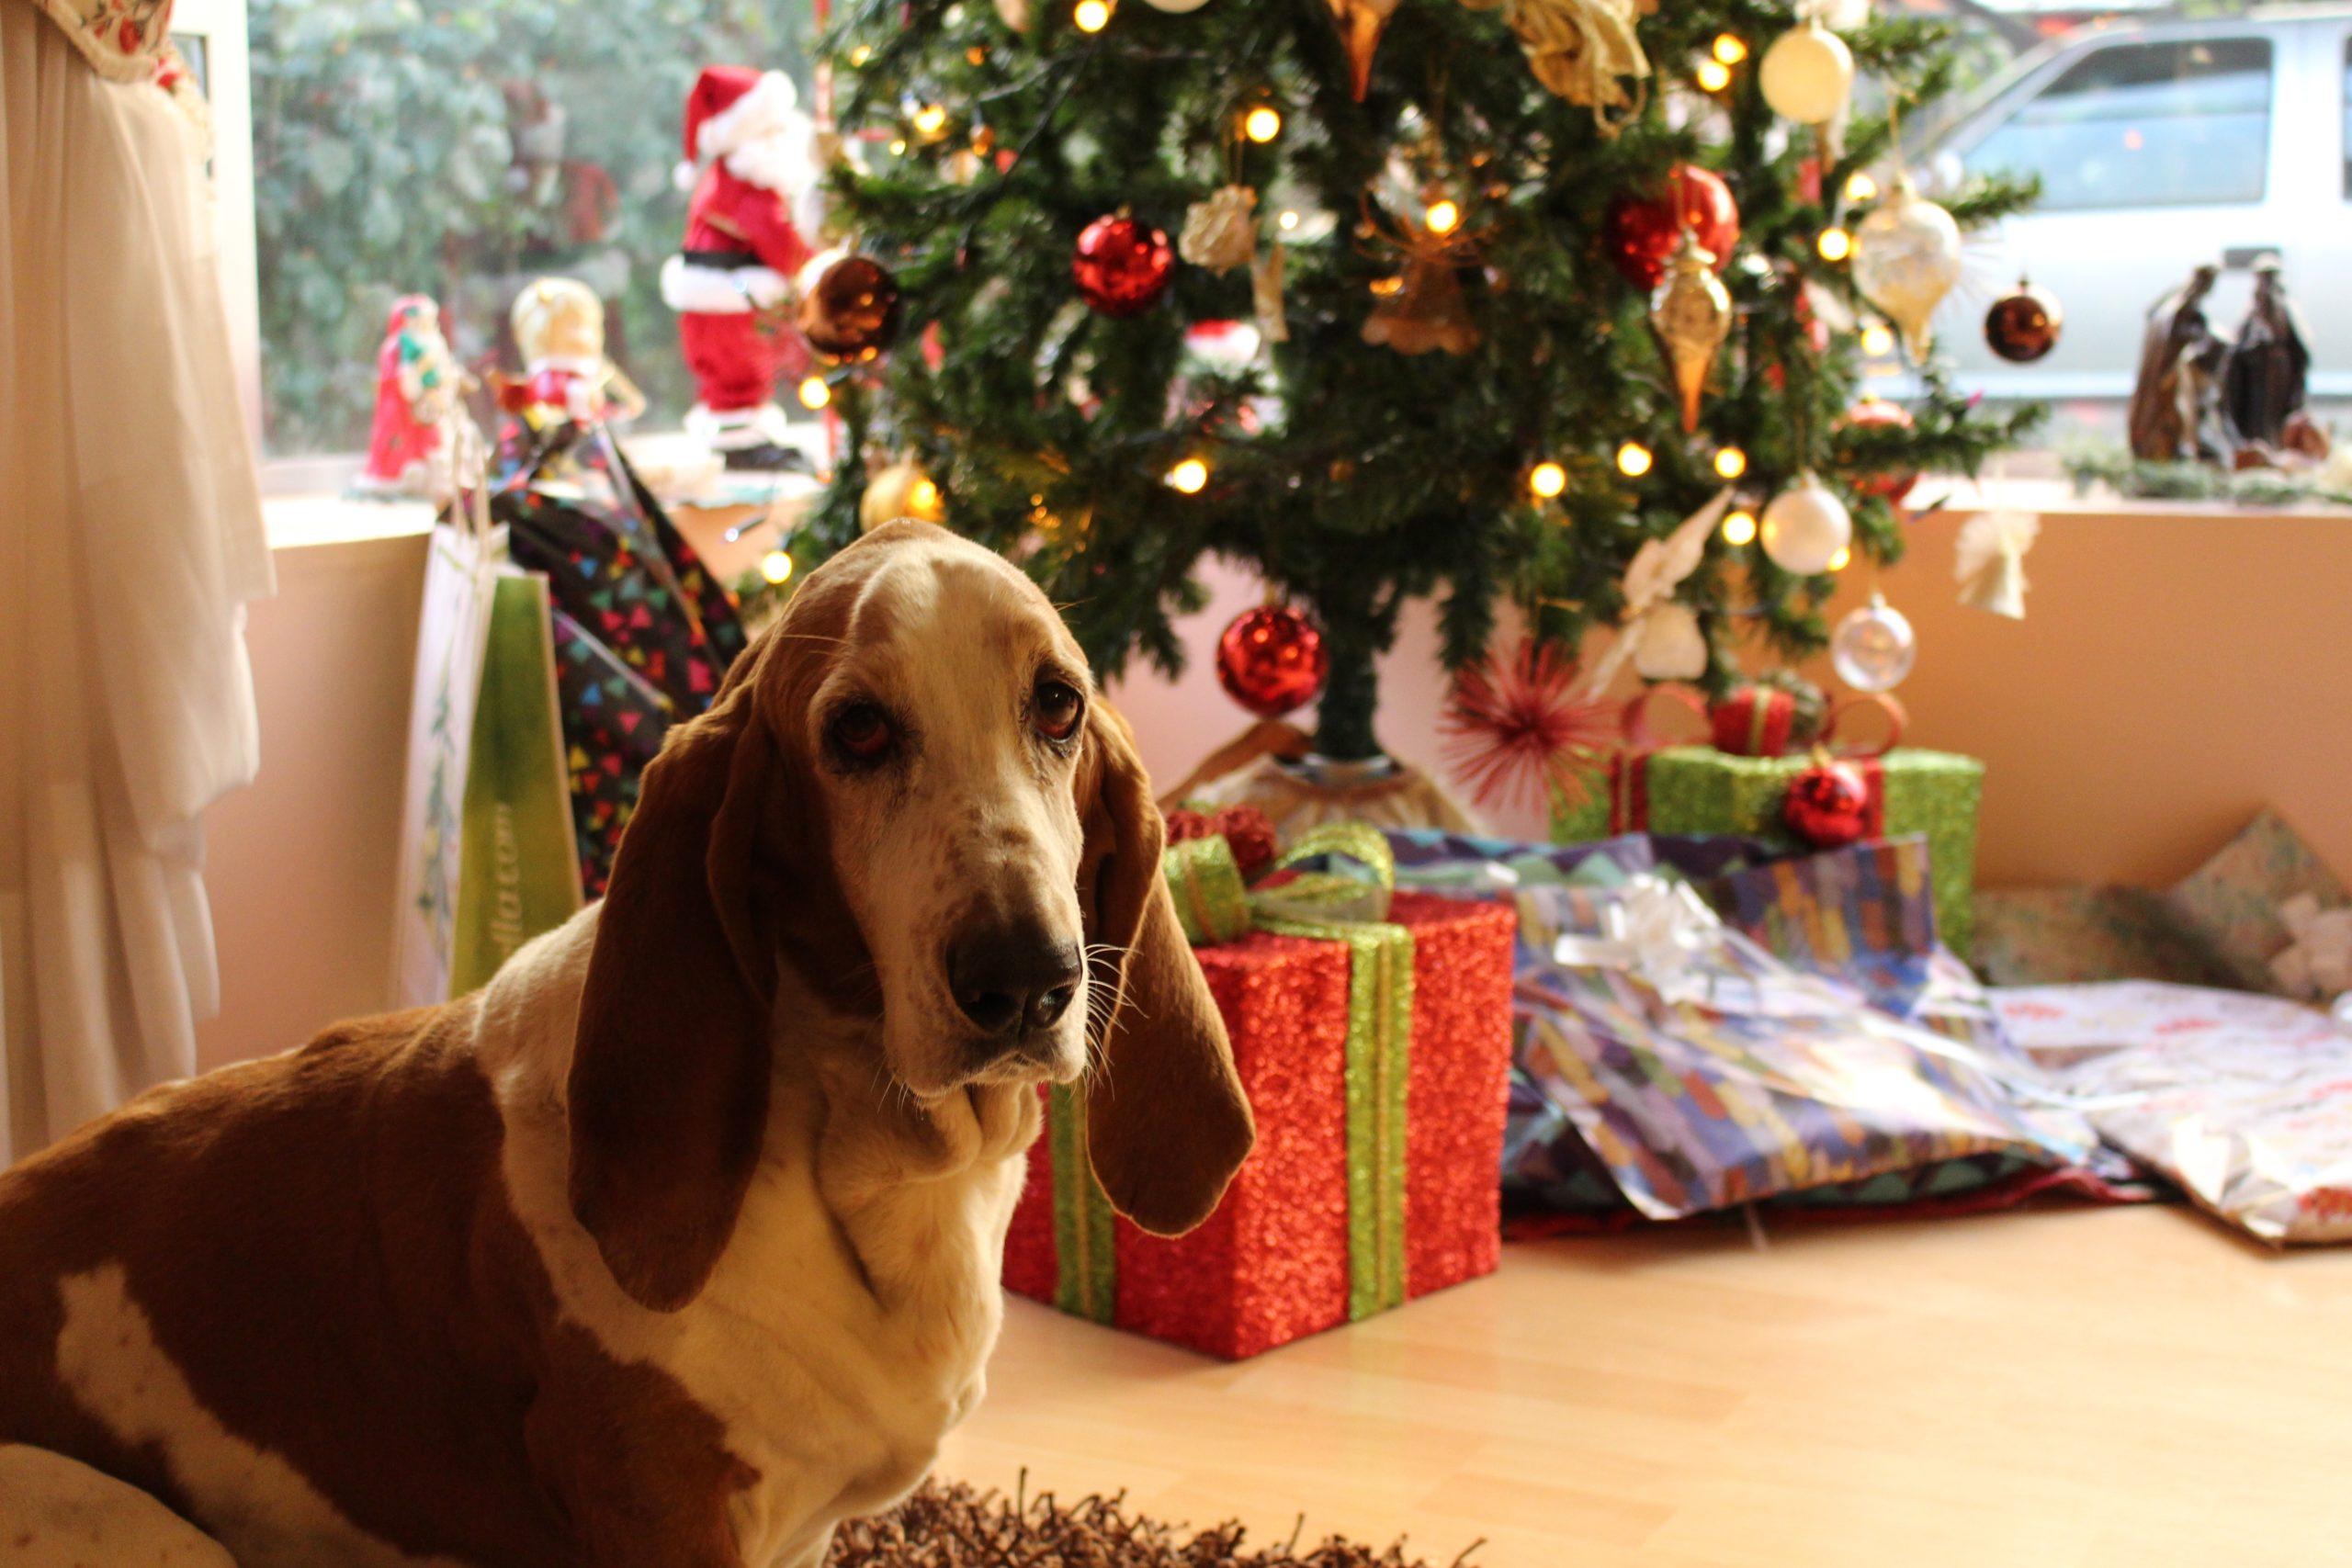 tan-and-white-basset-hound-near-the-christmas-tree-754491